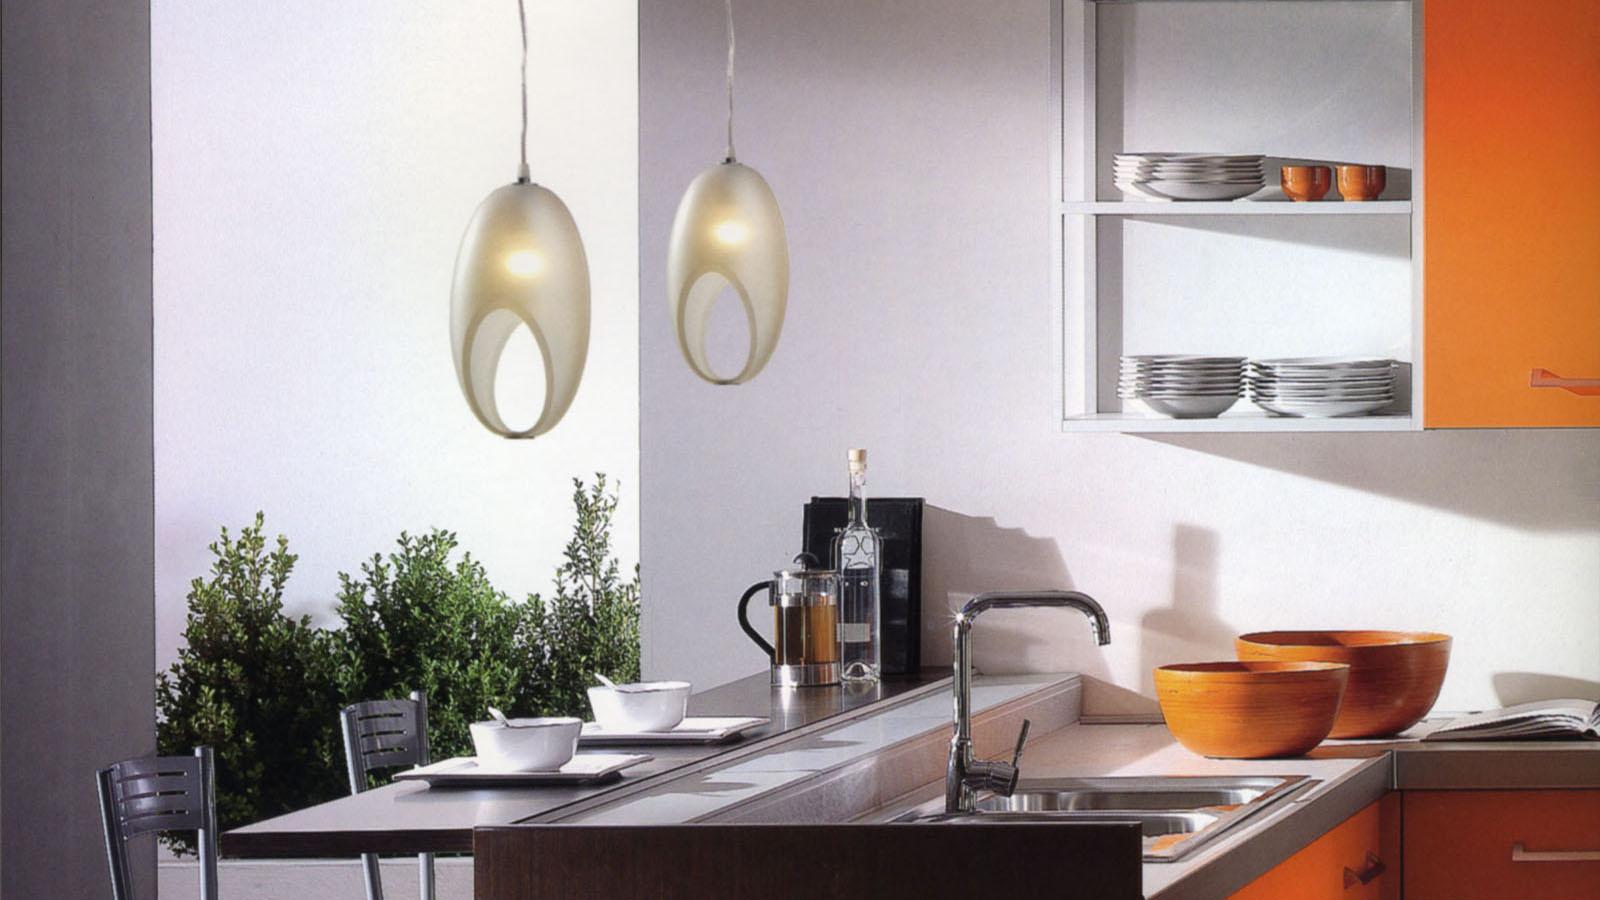 mgl-ovo-lamp-cucina